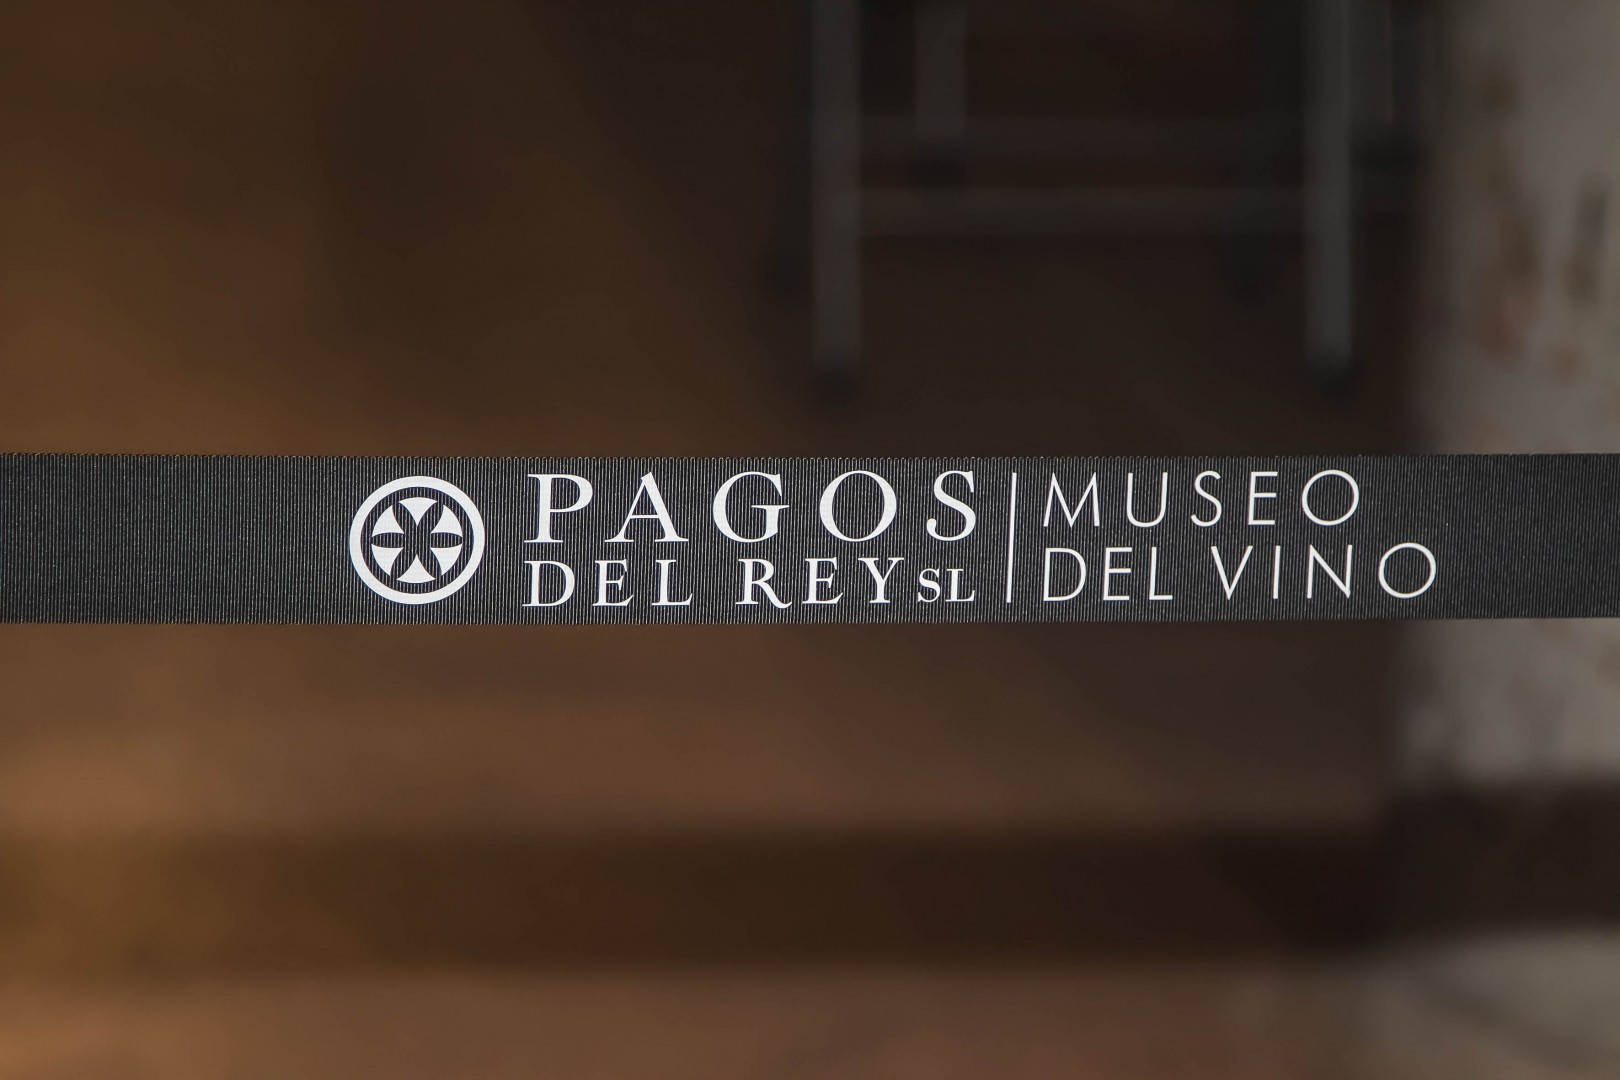 Museo-PagosdelRey